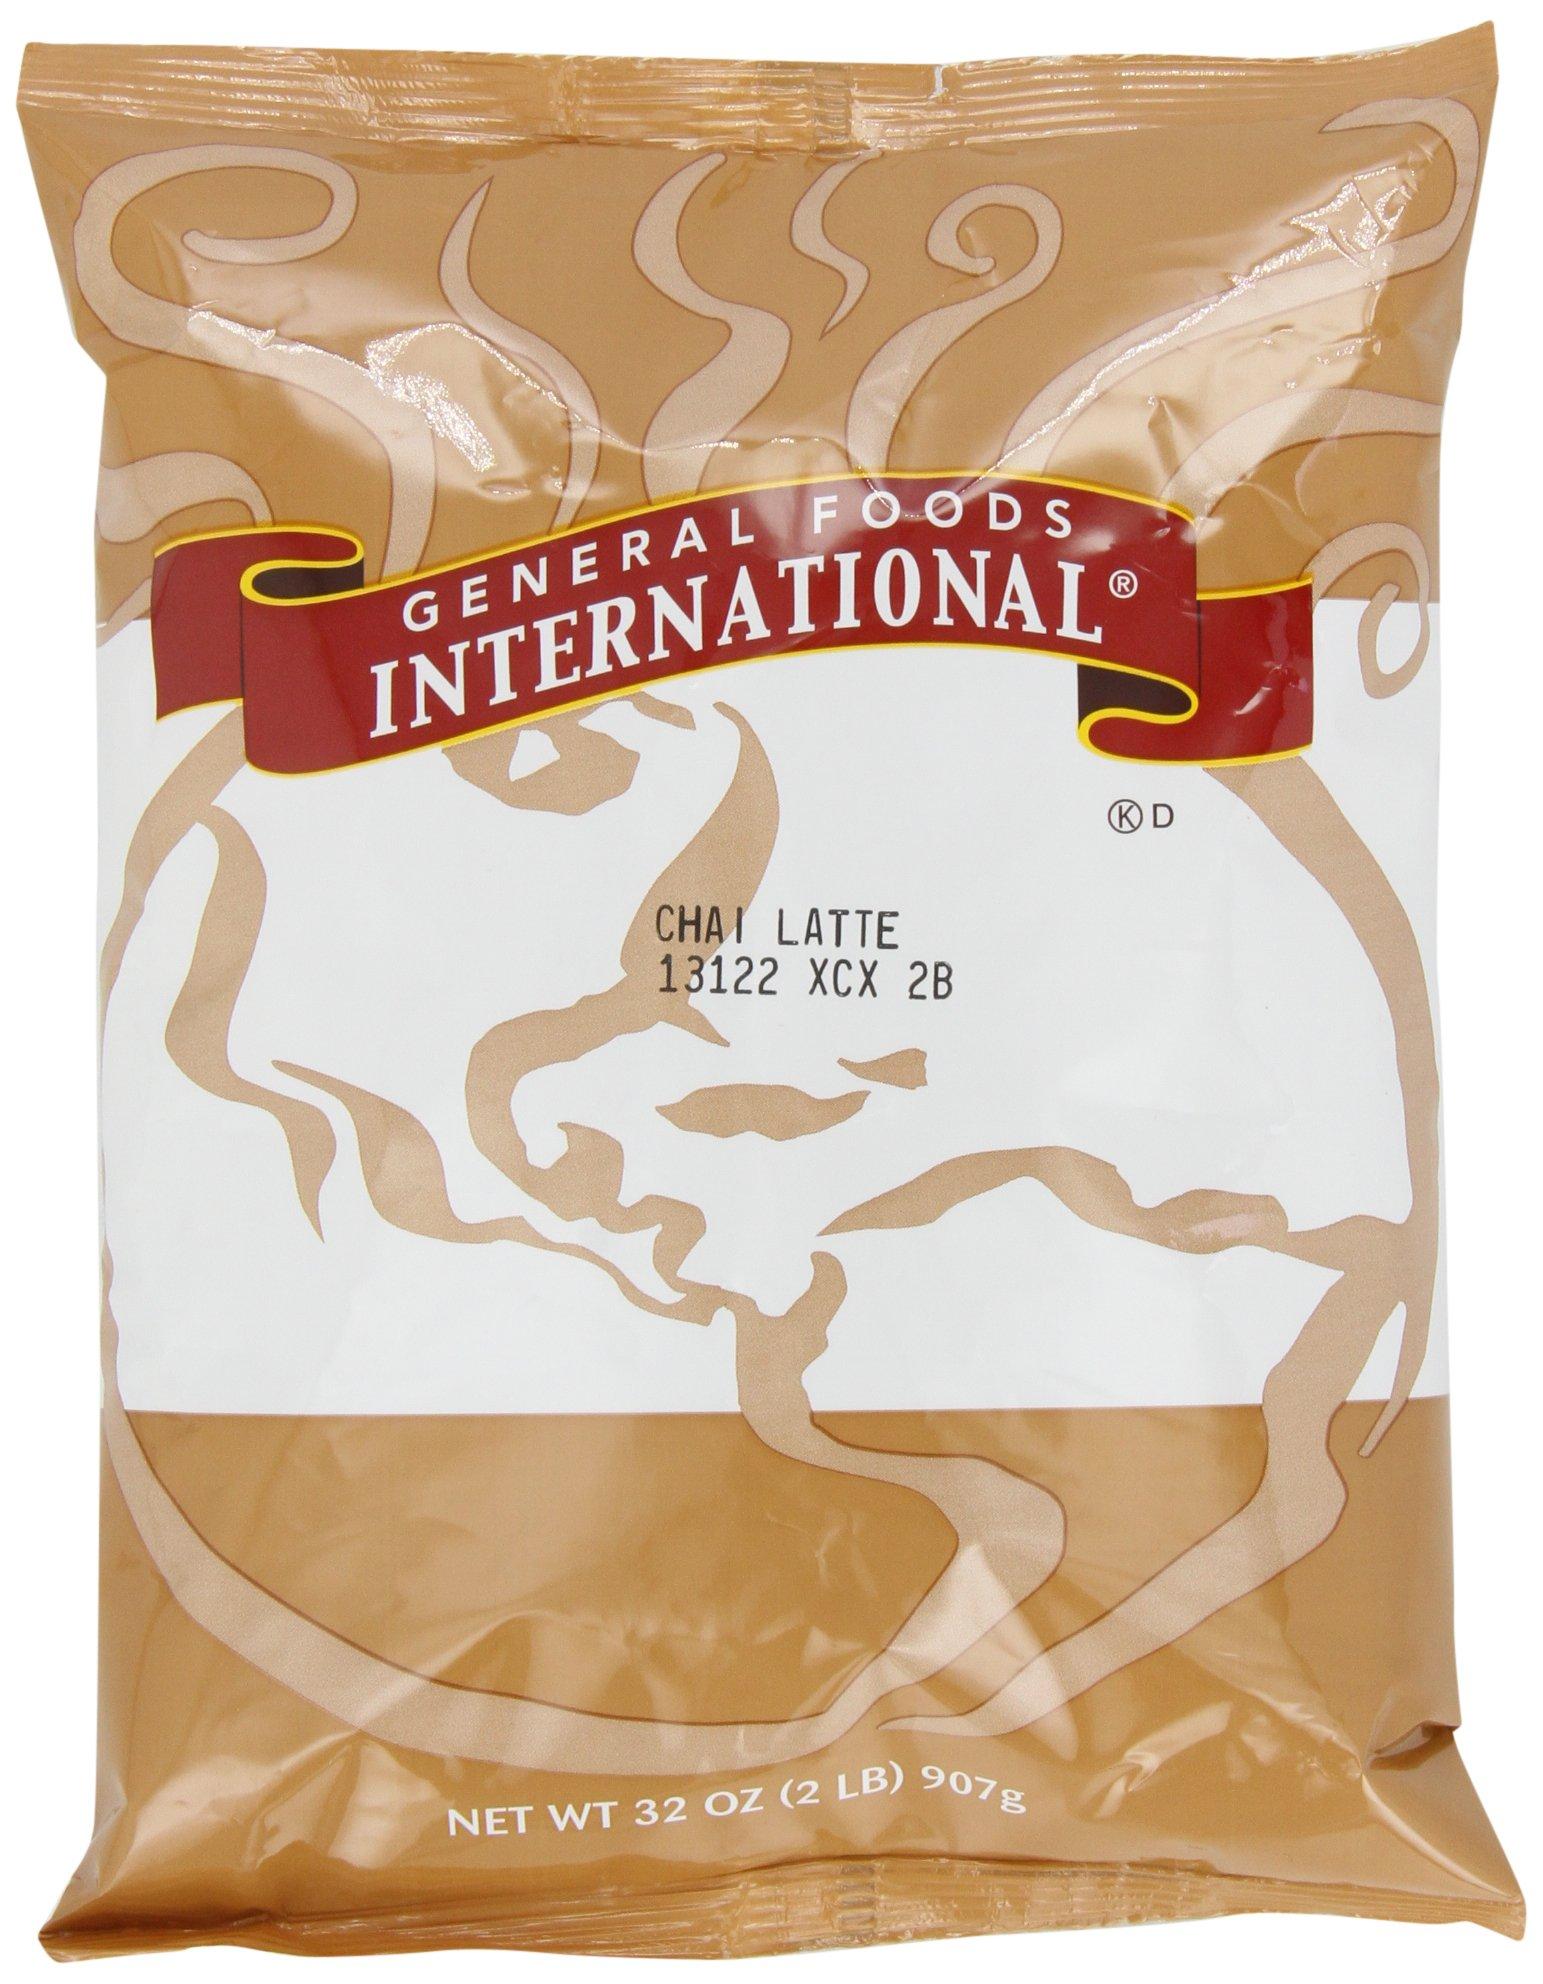 General Foods International Chai Latte Tea Mix (2 lbs Bags, Pack of 6) by General Foods International Coffee